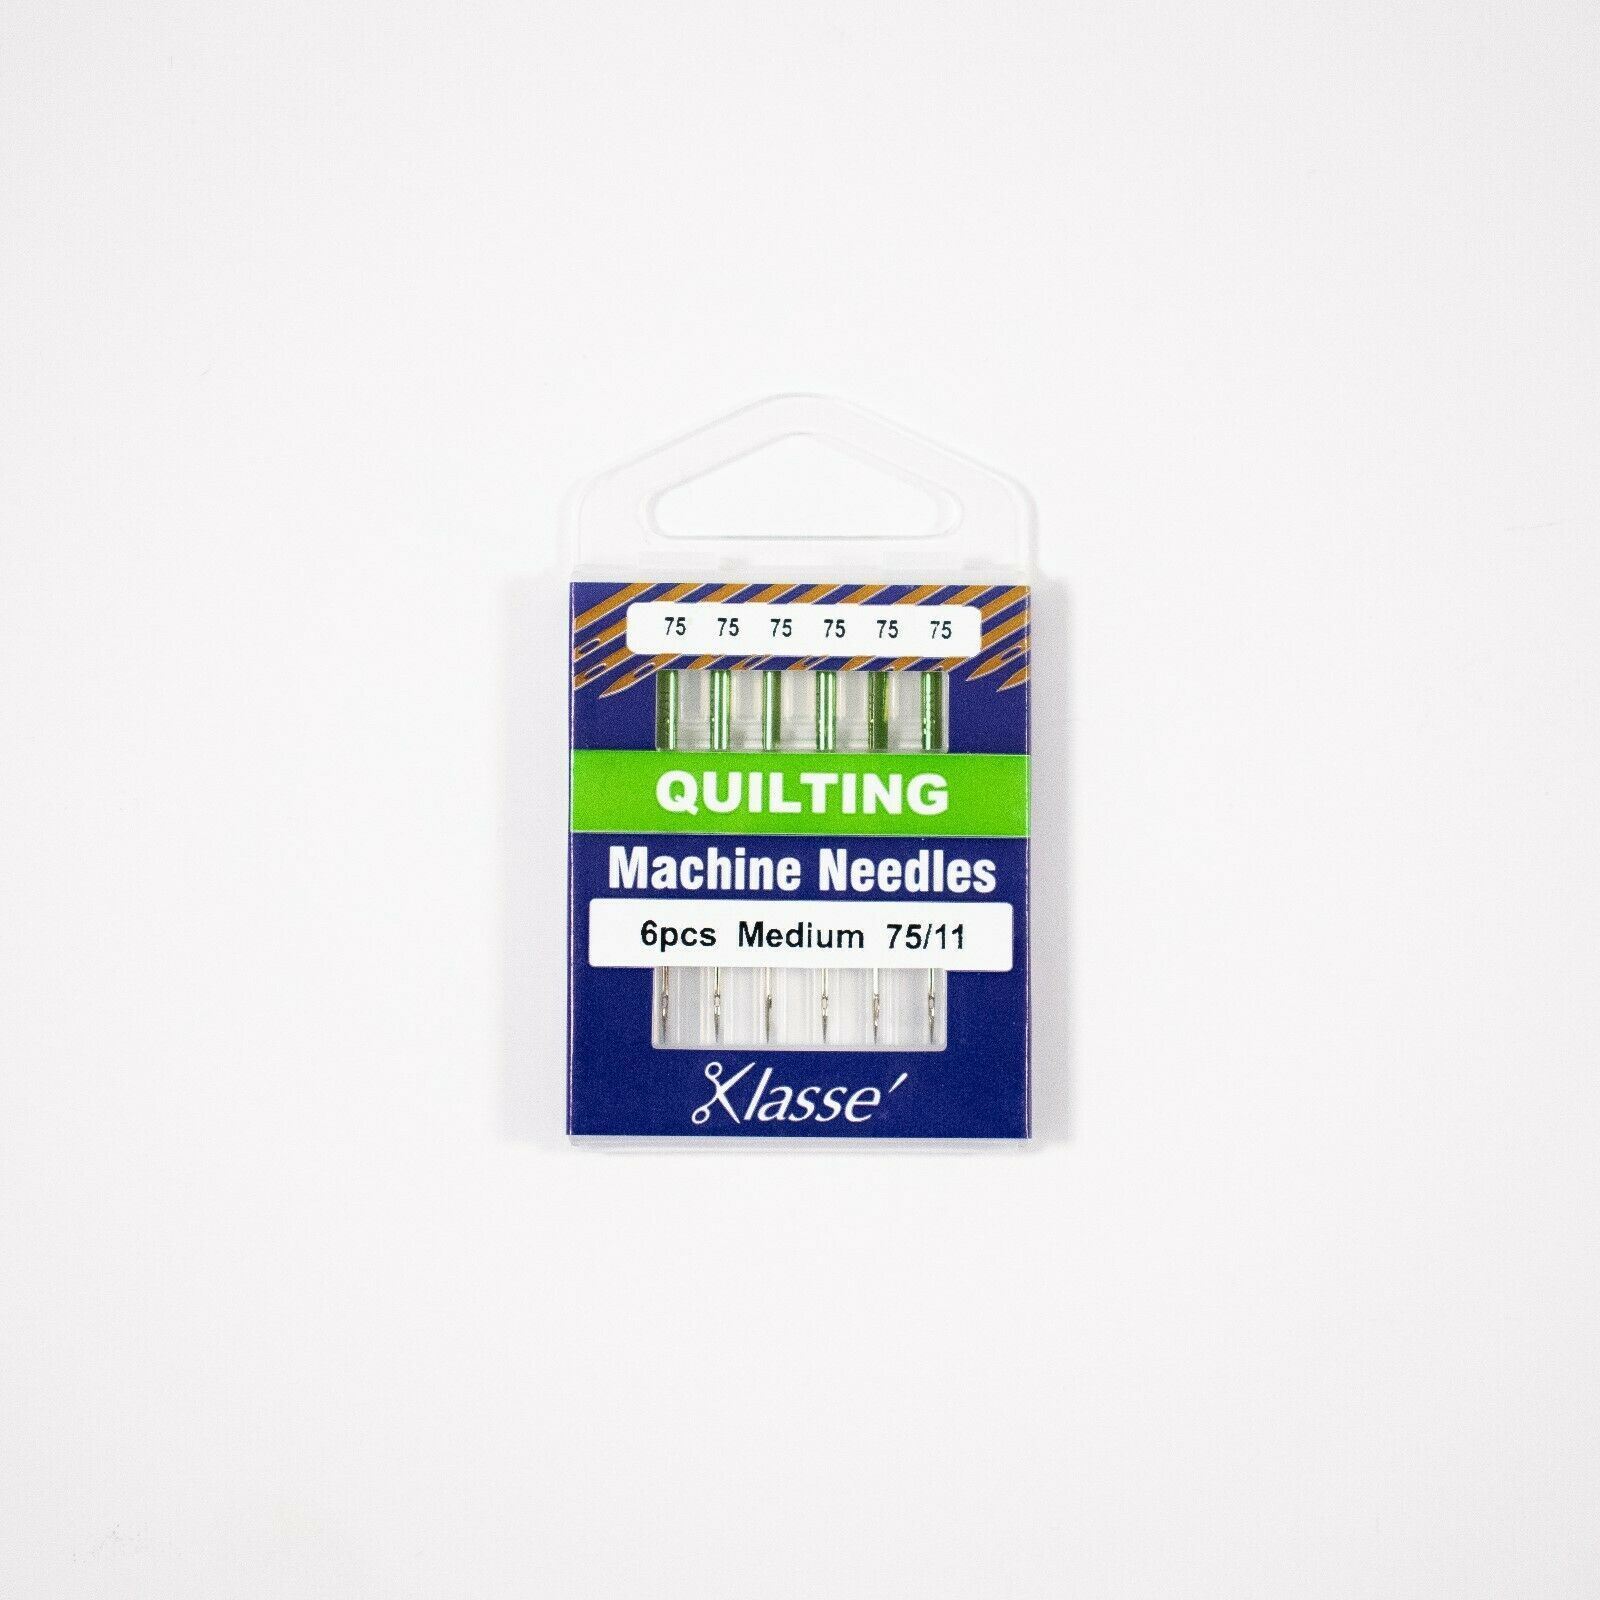 Klasse Quilting 75/11, 6 Needles, Bundle of  30 Needles - $12.86